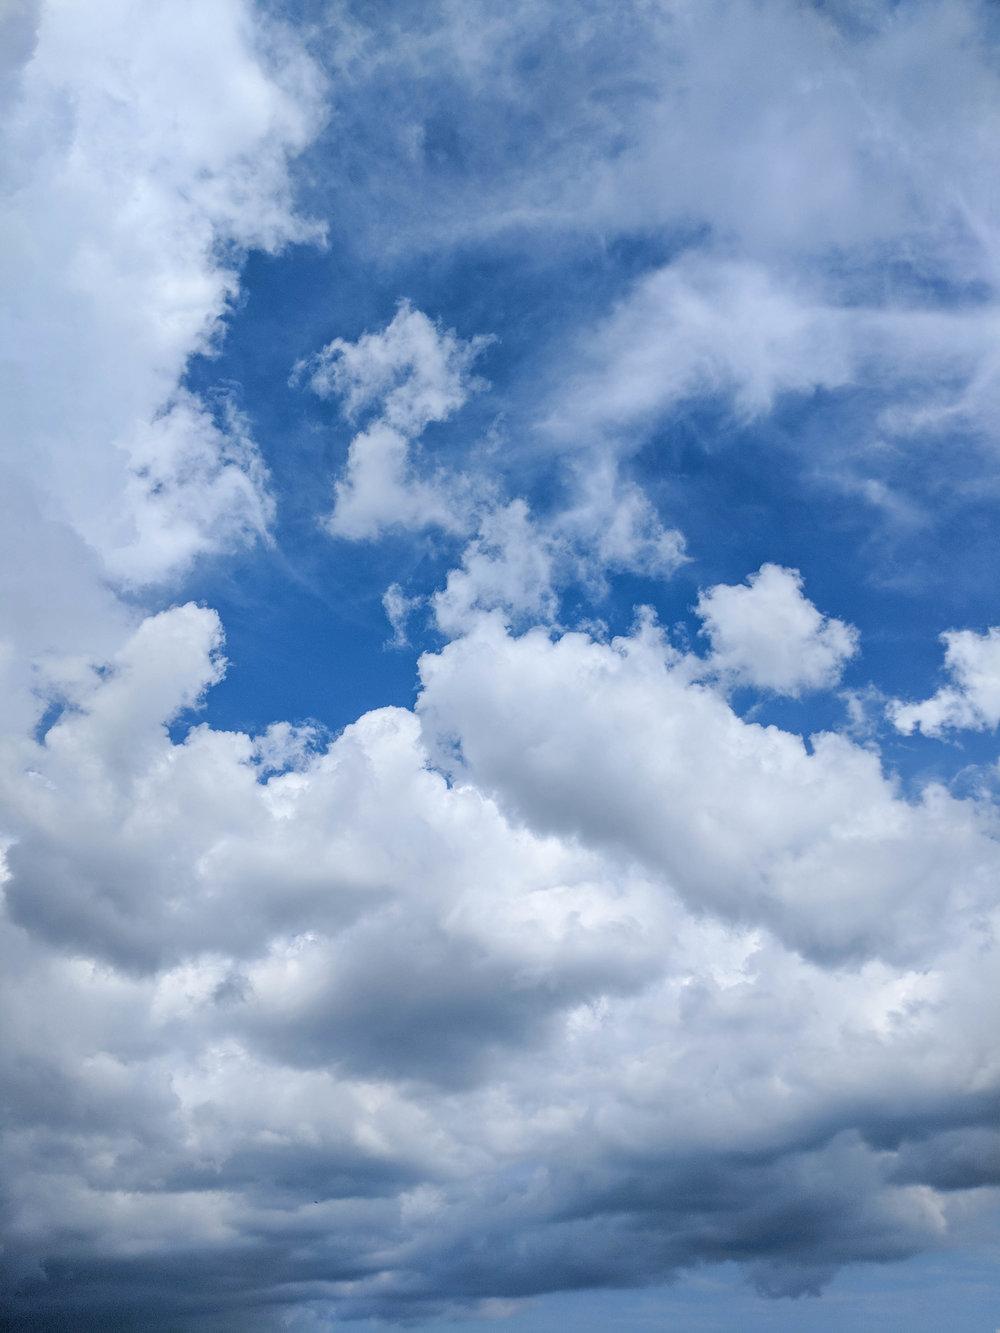 bri rinehart; photography; clouds